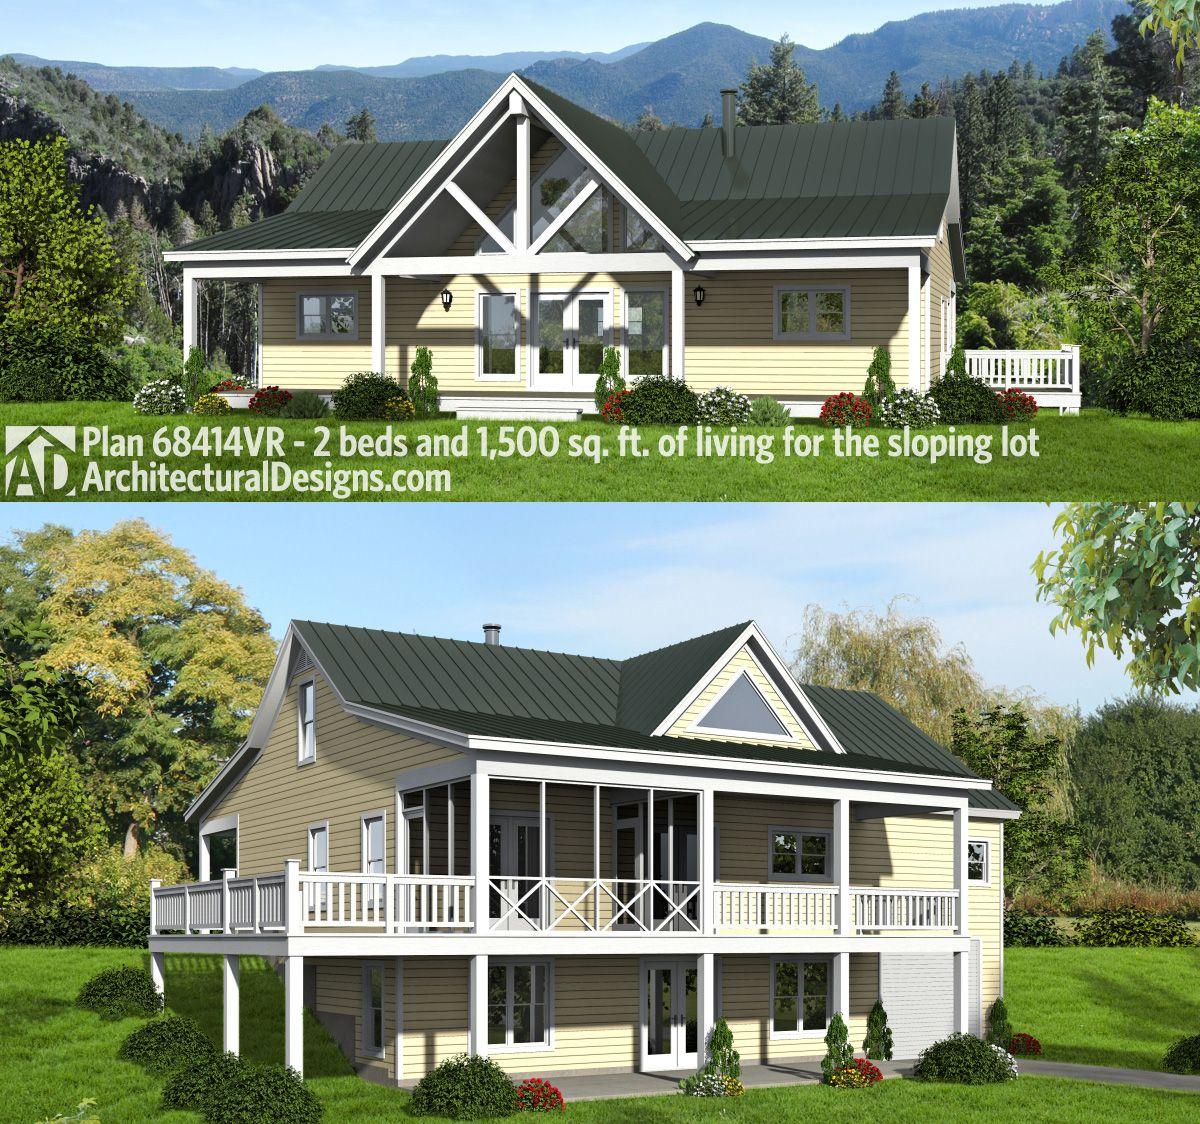 Plan 500007vv Craftsman House Plan With Main Floor Game Room And Bonus Over Garage Craftsman House Plan Craftsman House Plans Dream House Plans